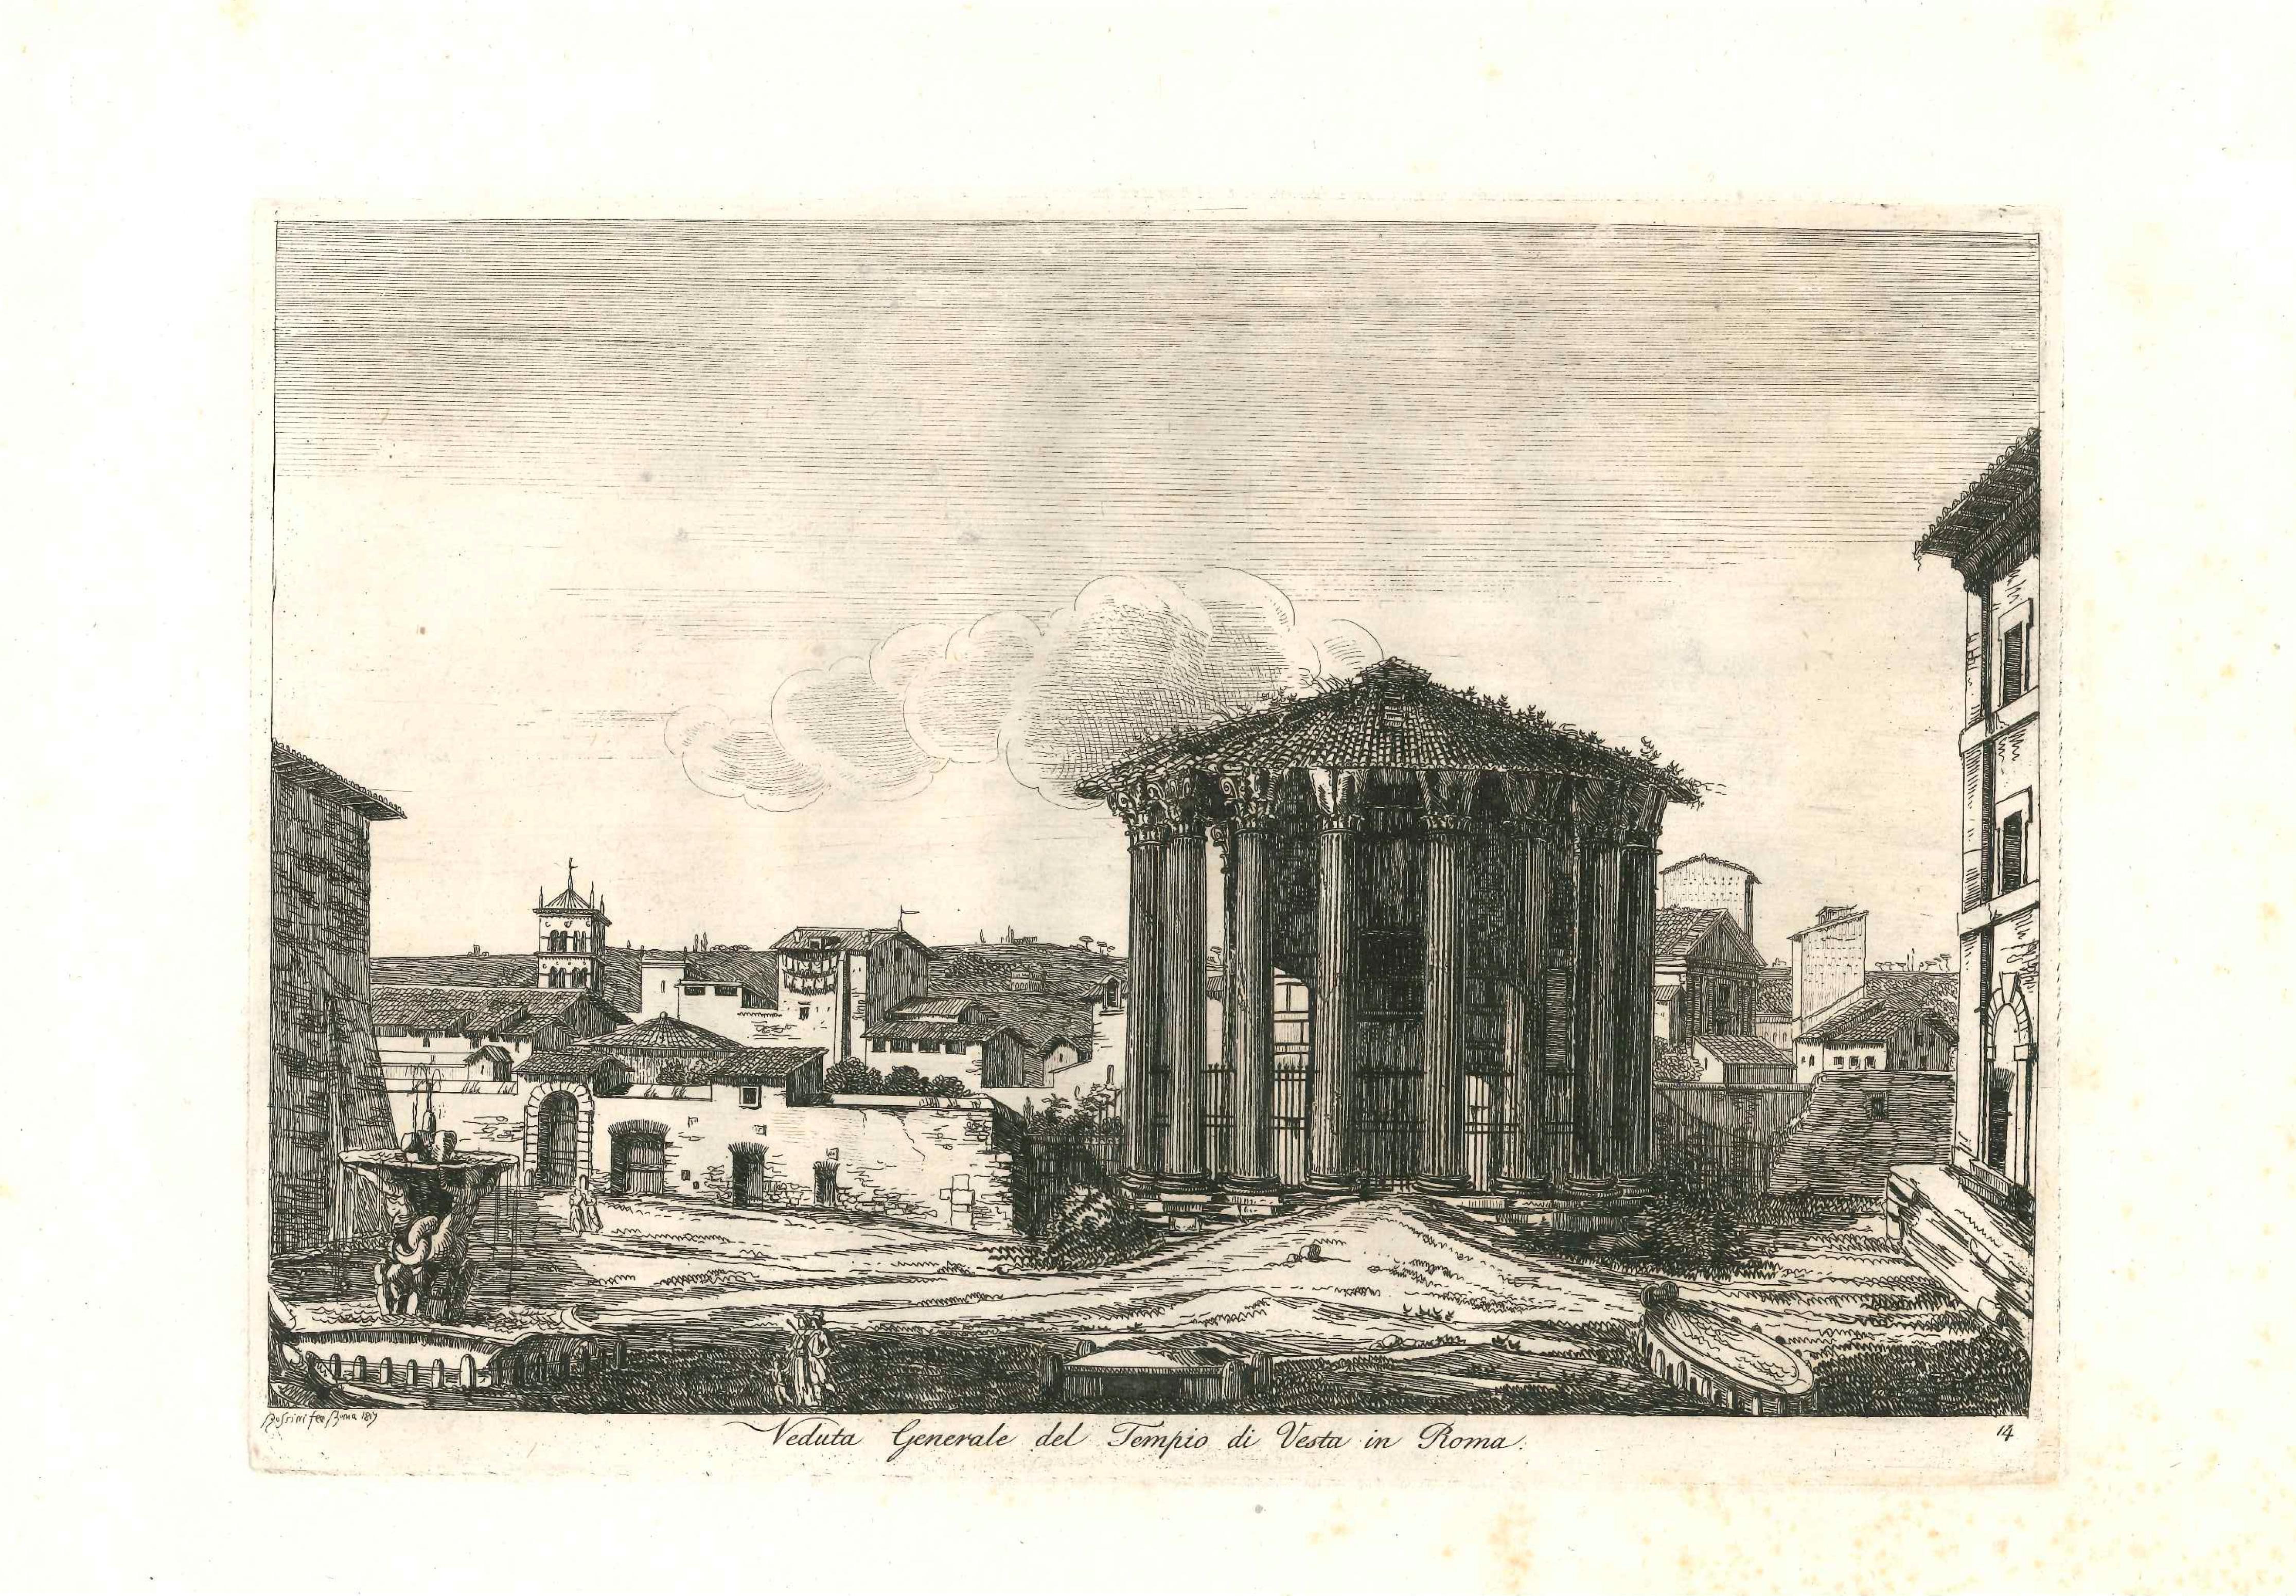 Landscape Figurative Engraving Print View Of Rome by Luigi Rossini 19th Century